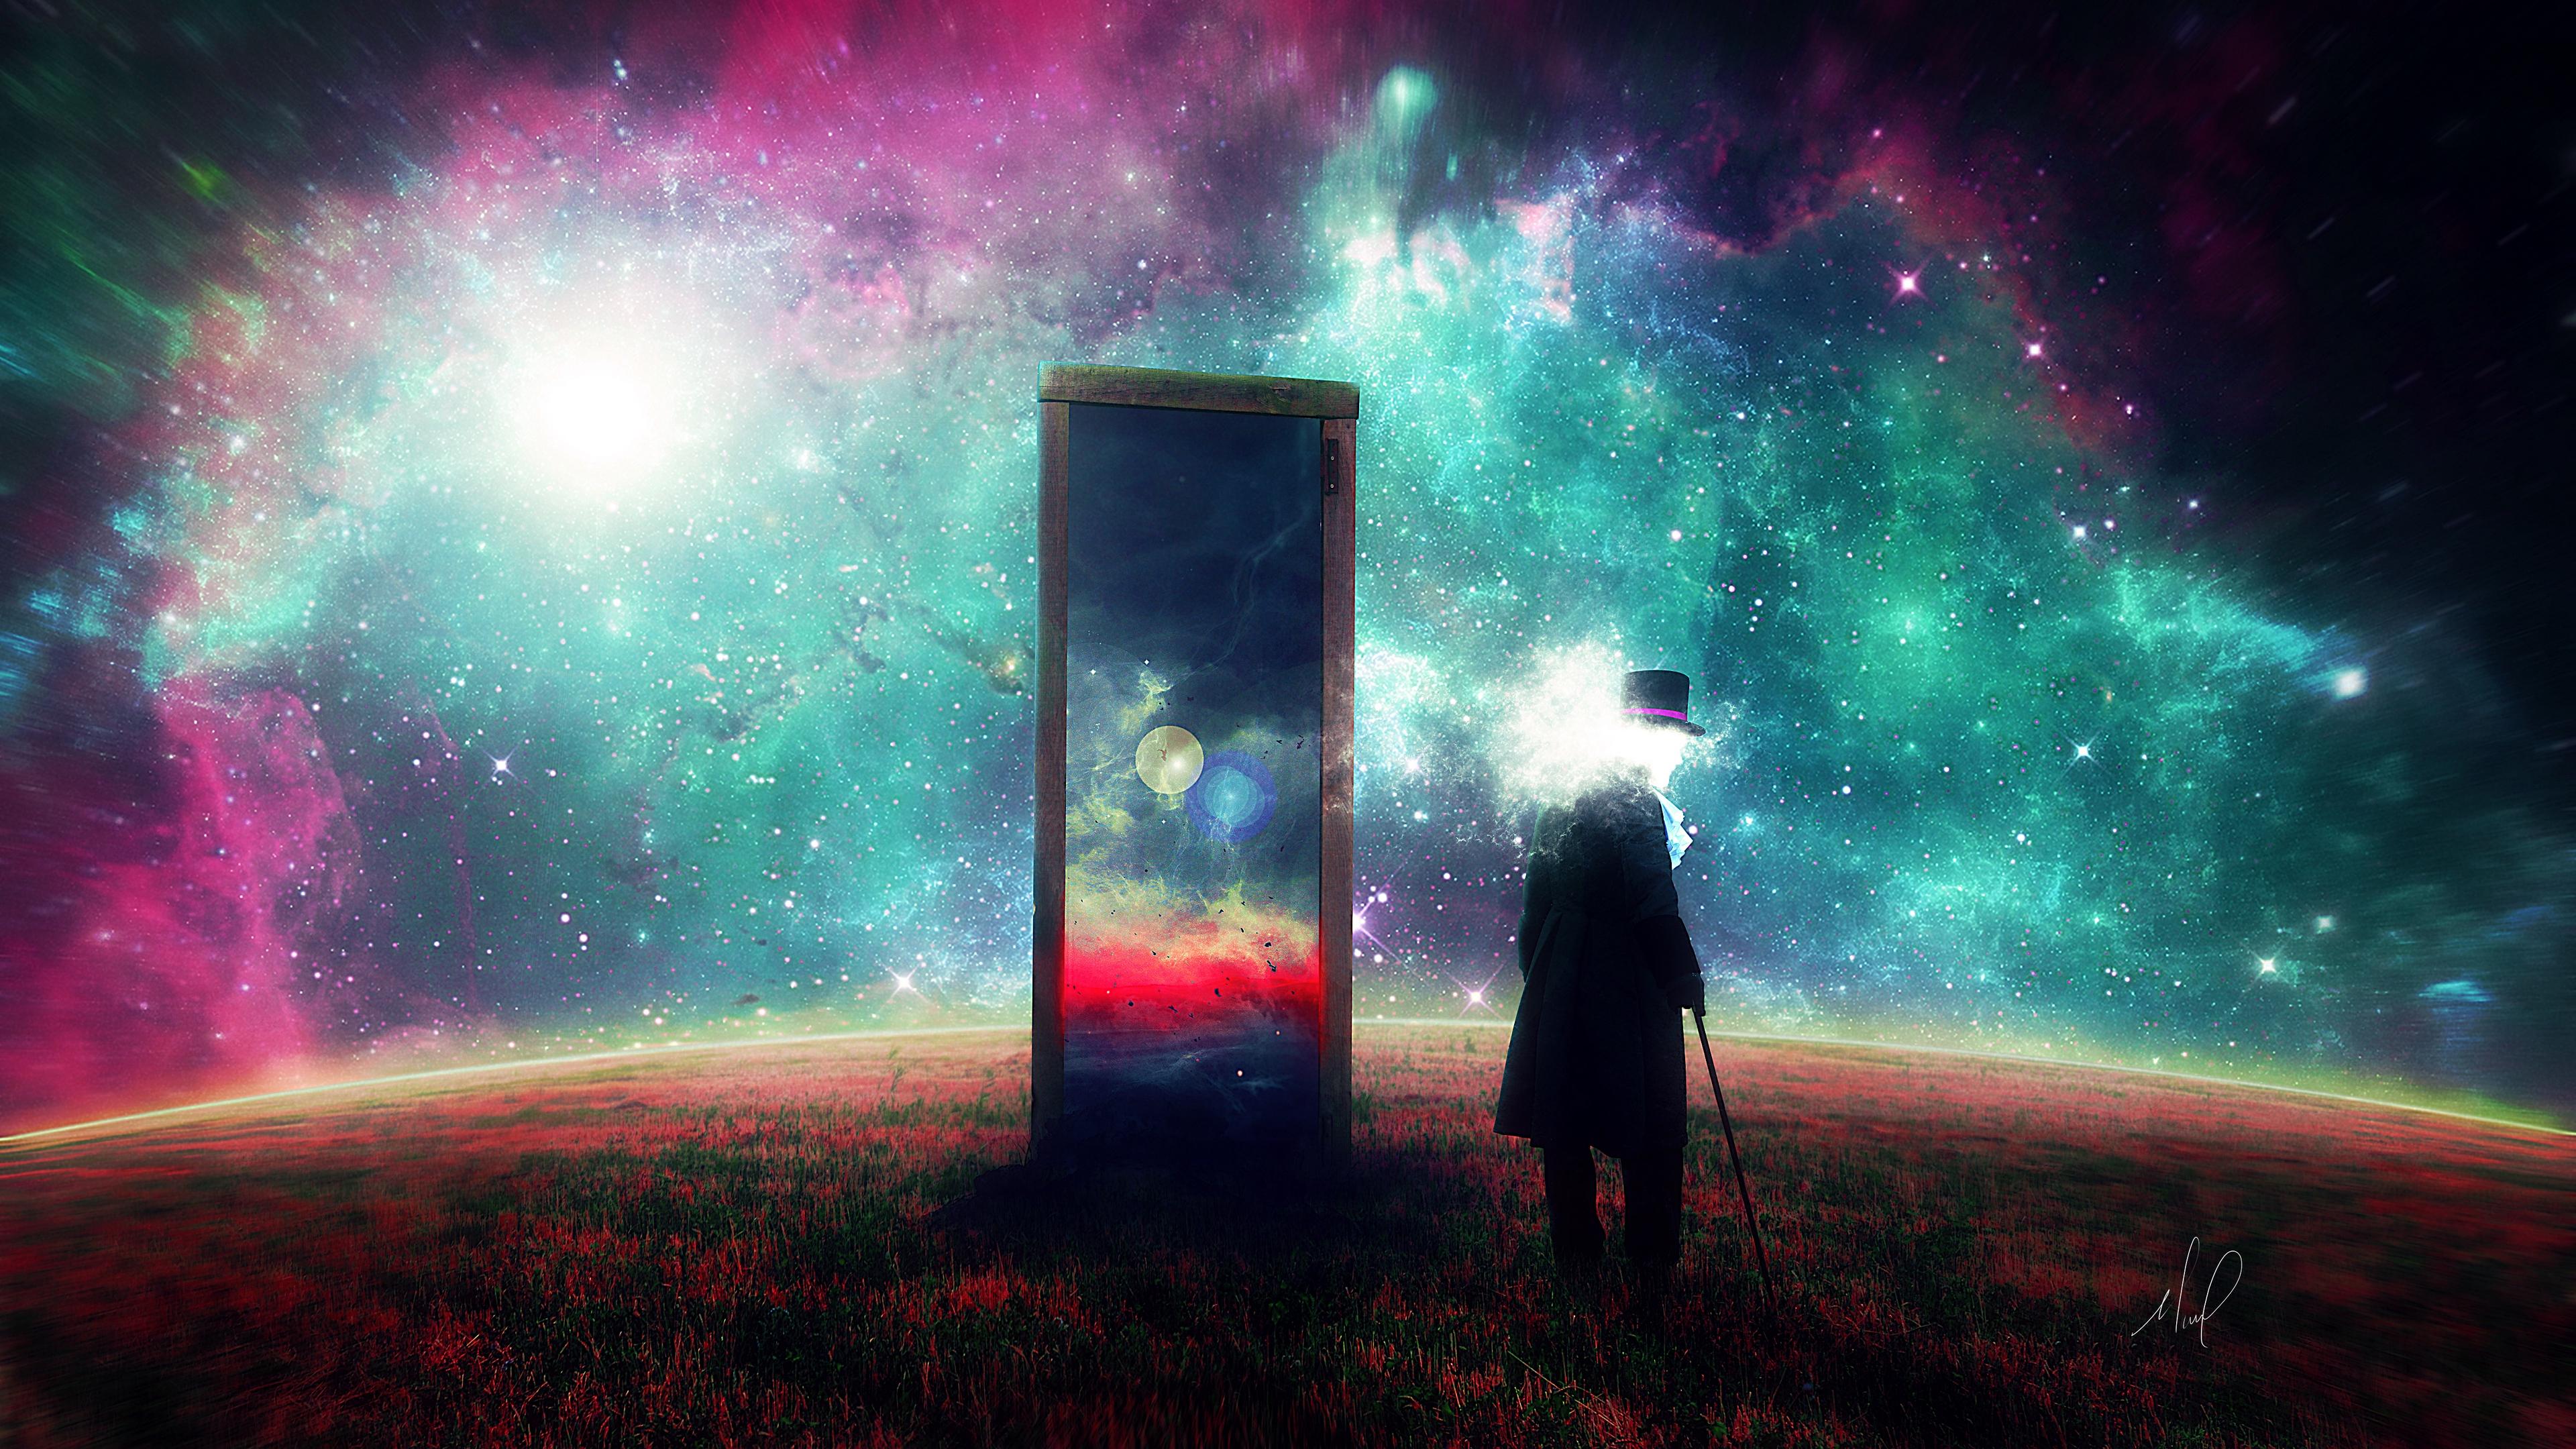 man mirror space art surrealism 4k 1536098495 - man, mirror, space, art, surrealism 4k - Space, Mirror, Man